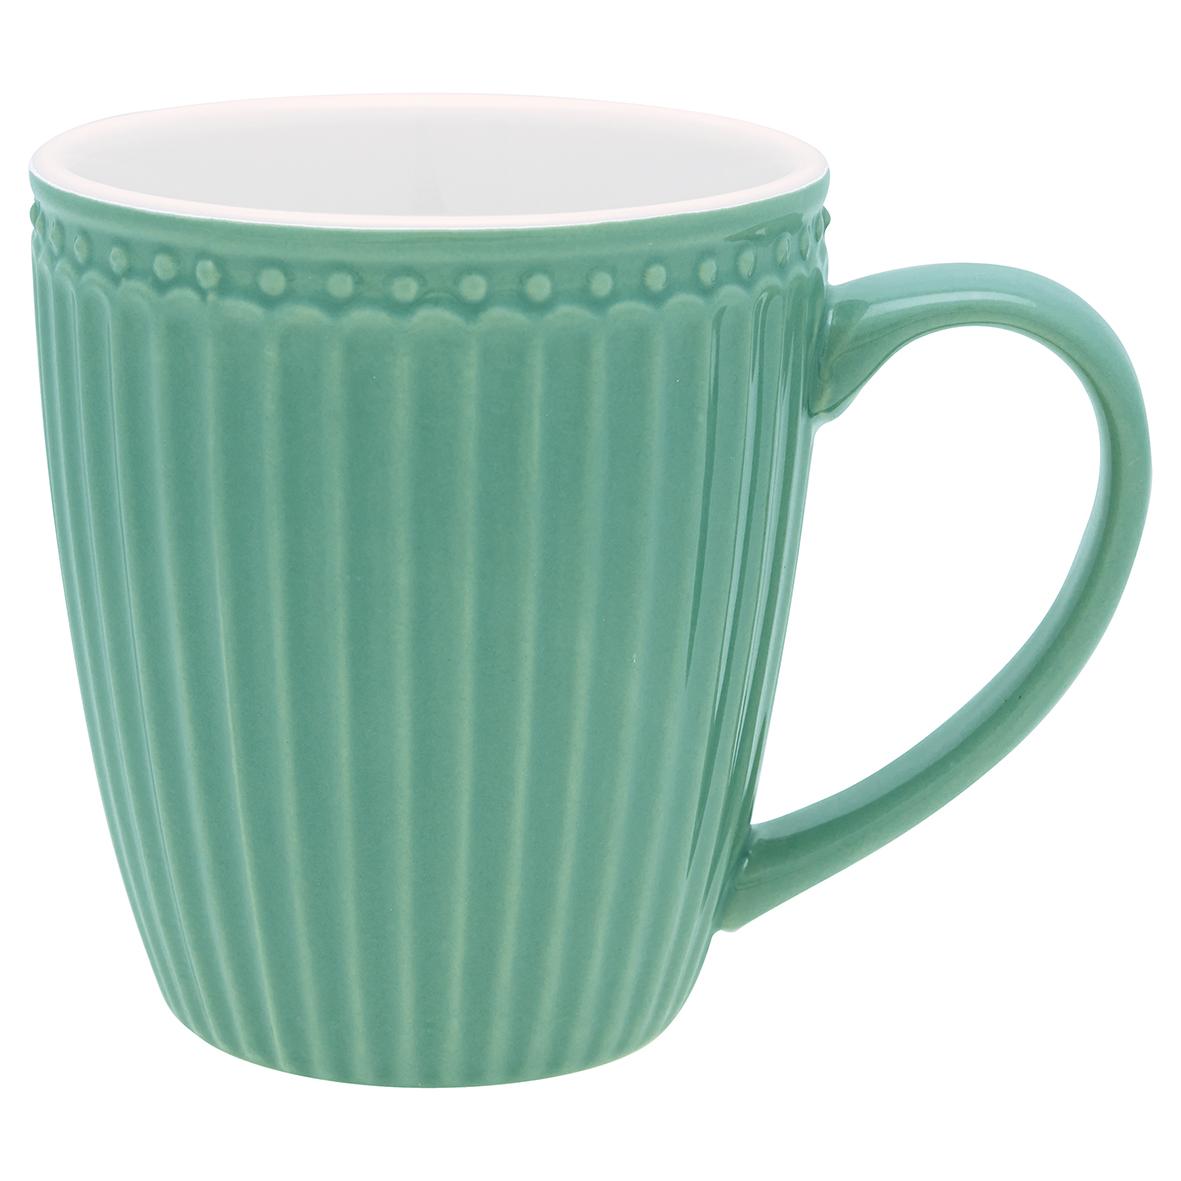 Greengate Mug Alice dusty green Everyday Kollektion Becher